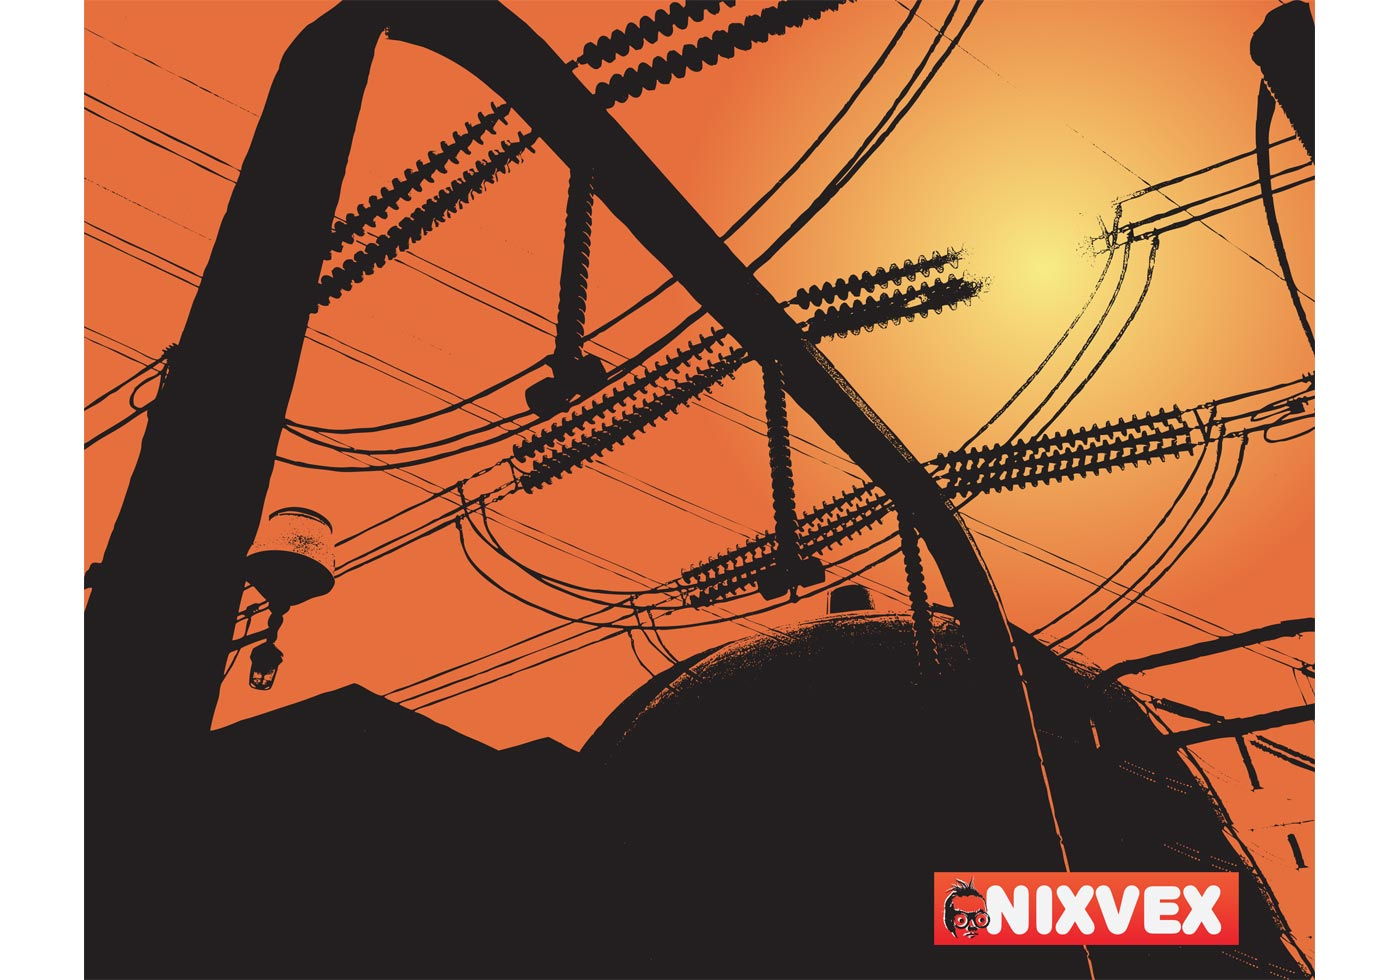 "Скачать Eco Technology Flat Icons: NixVex ""Atomic Power Station"" Free Vector Image"